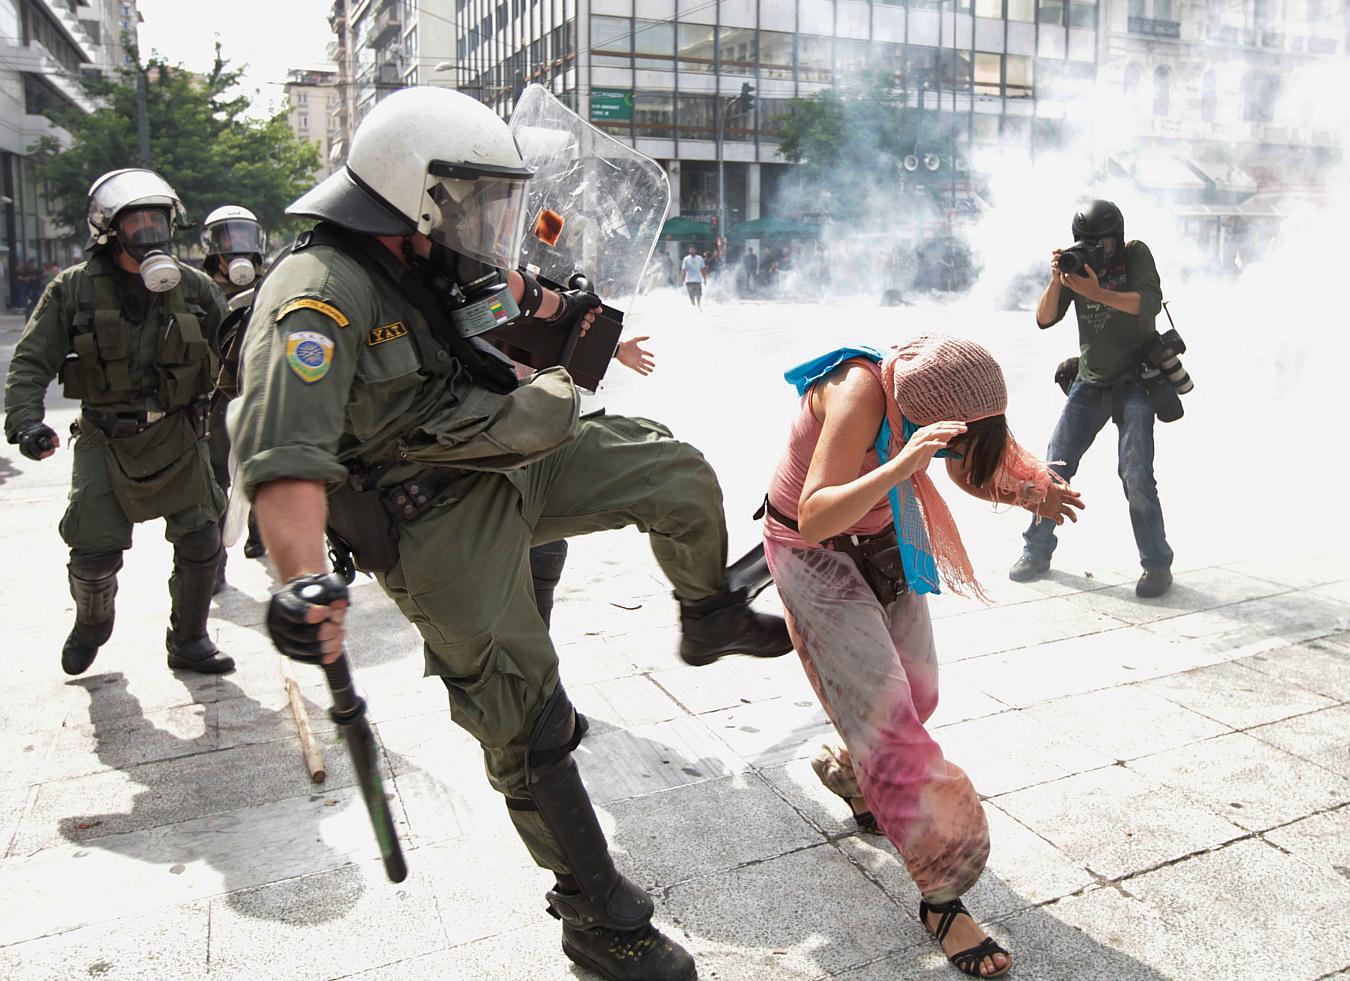 Jornadas de protesta Grecia 2011. Pict35